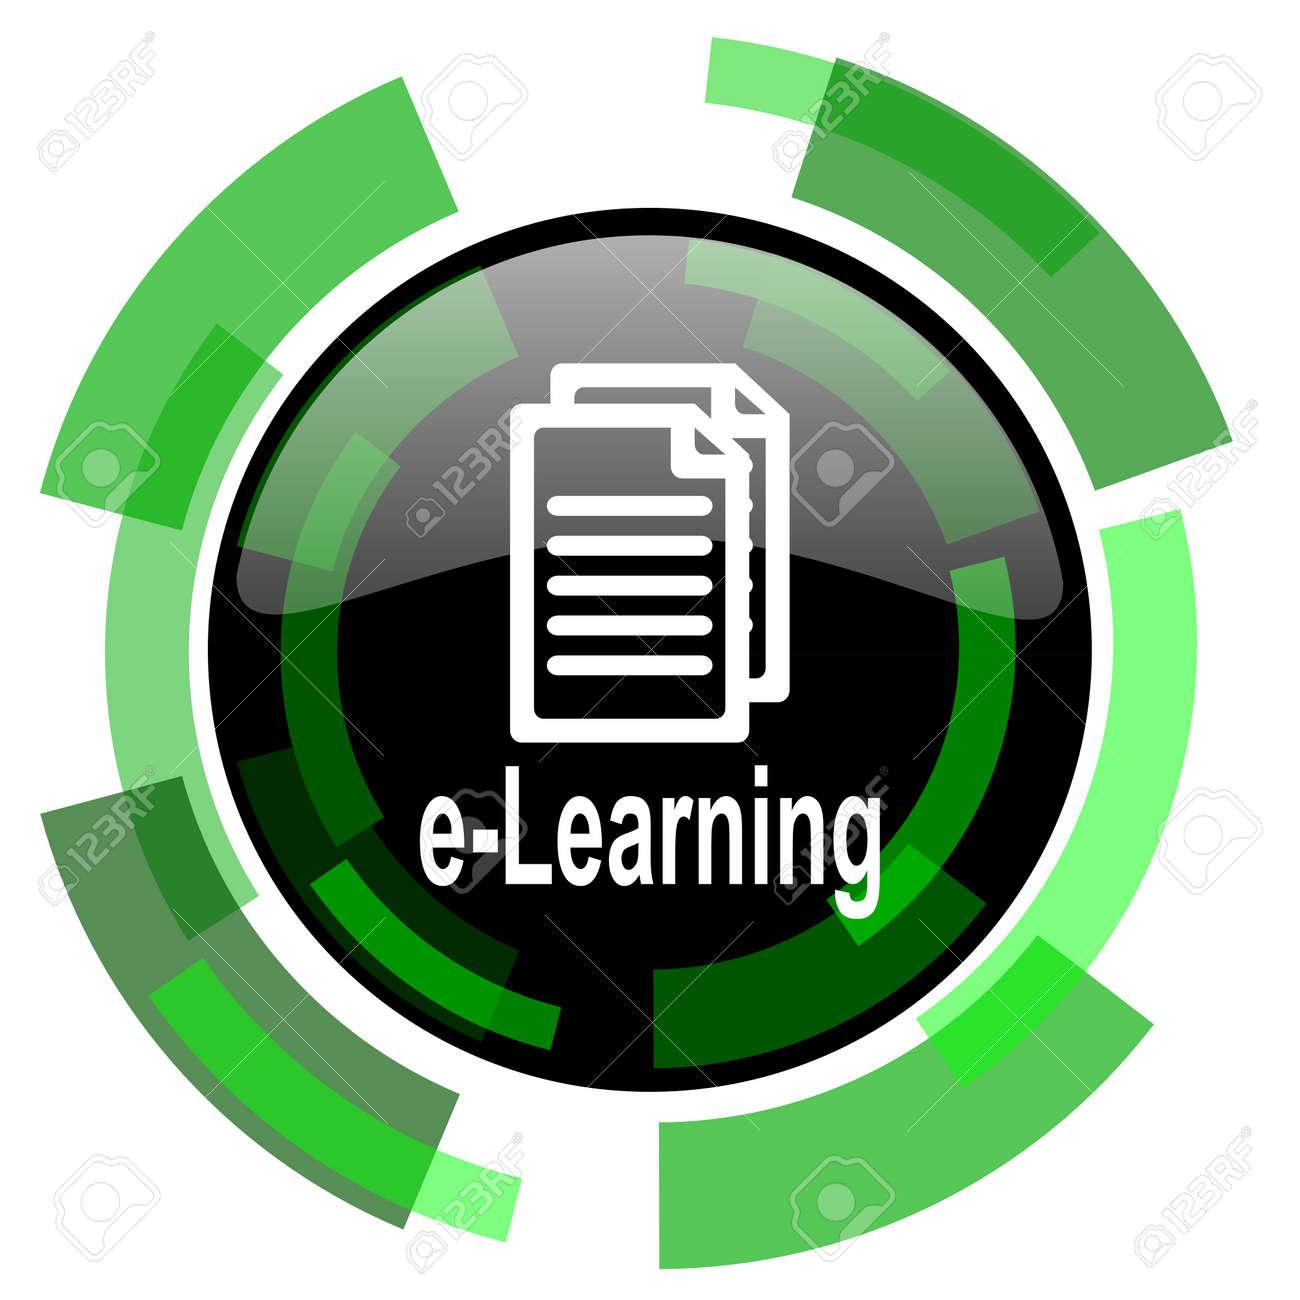 E Learning Symbol Grün Modernes Design Glänzend Runde Taste Web